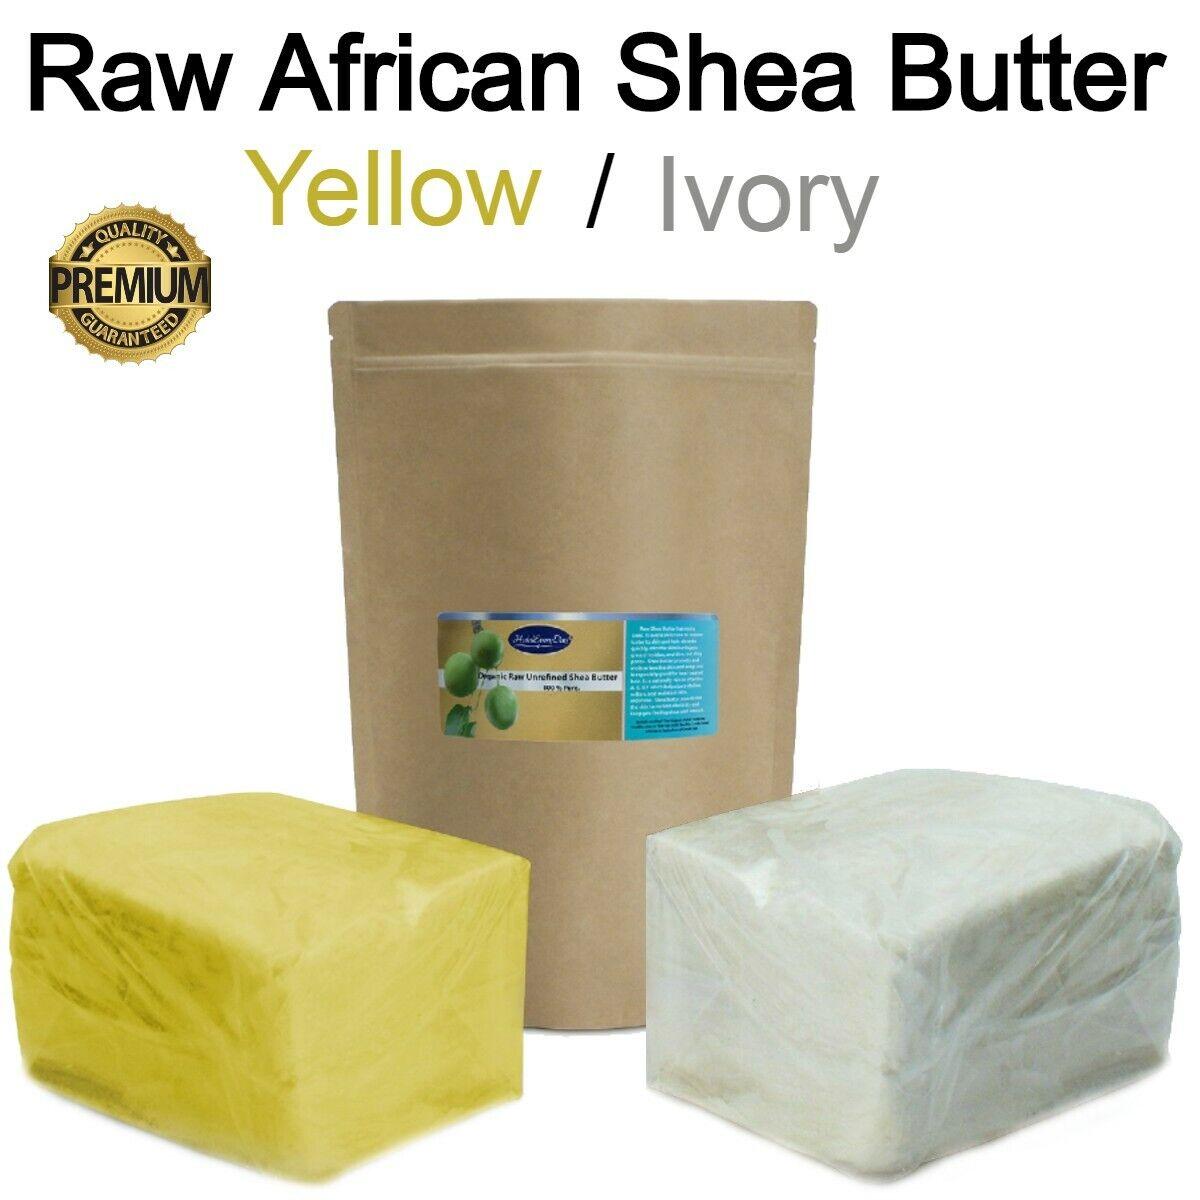 Raw African Shea Butter 100% PREMIUM Organic Unrefined Pure